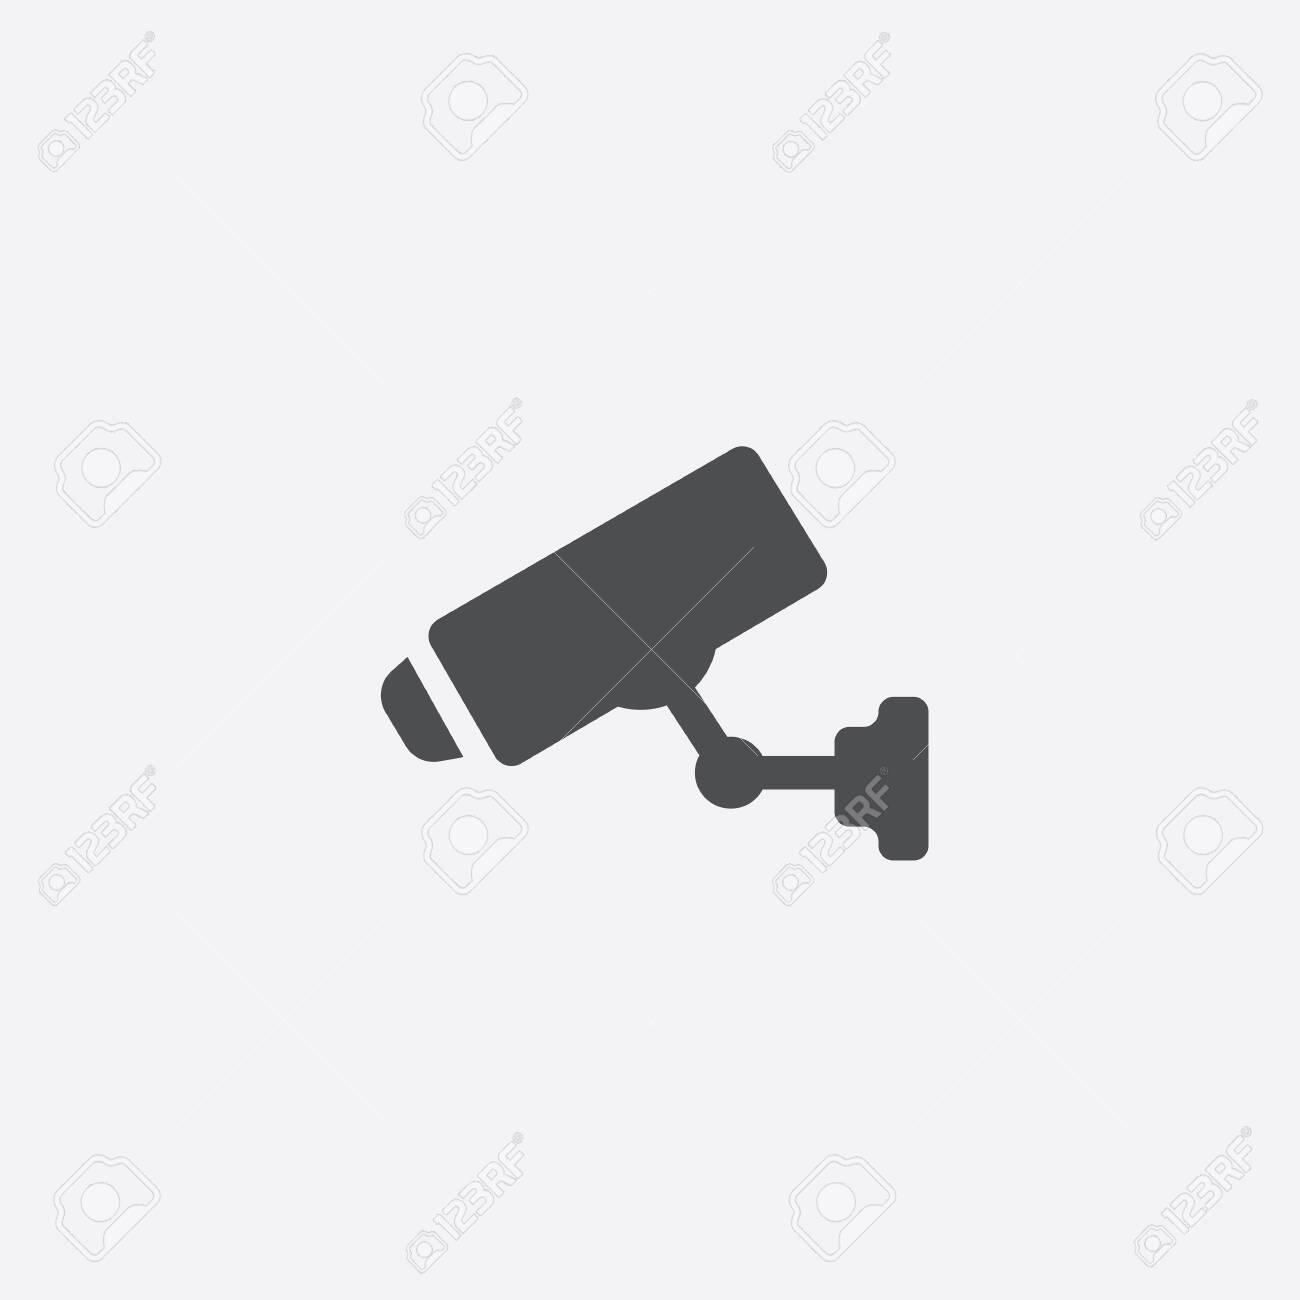 security camera icon - 143431856